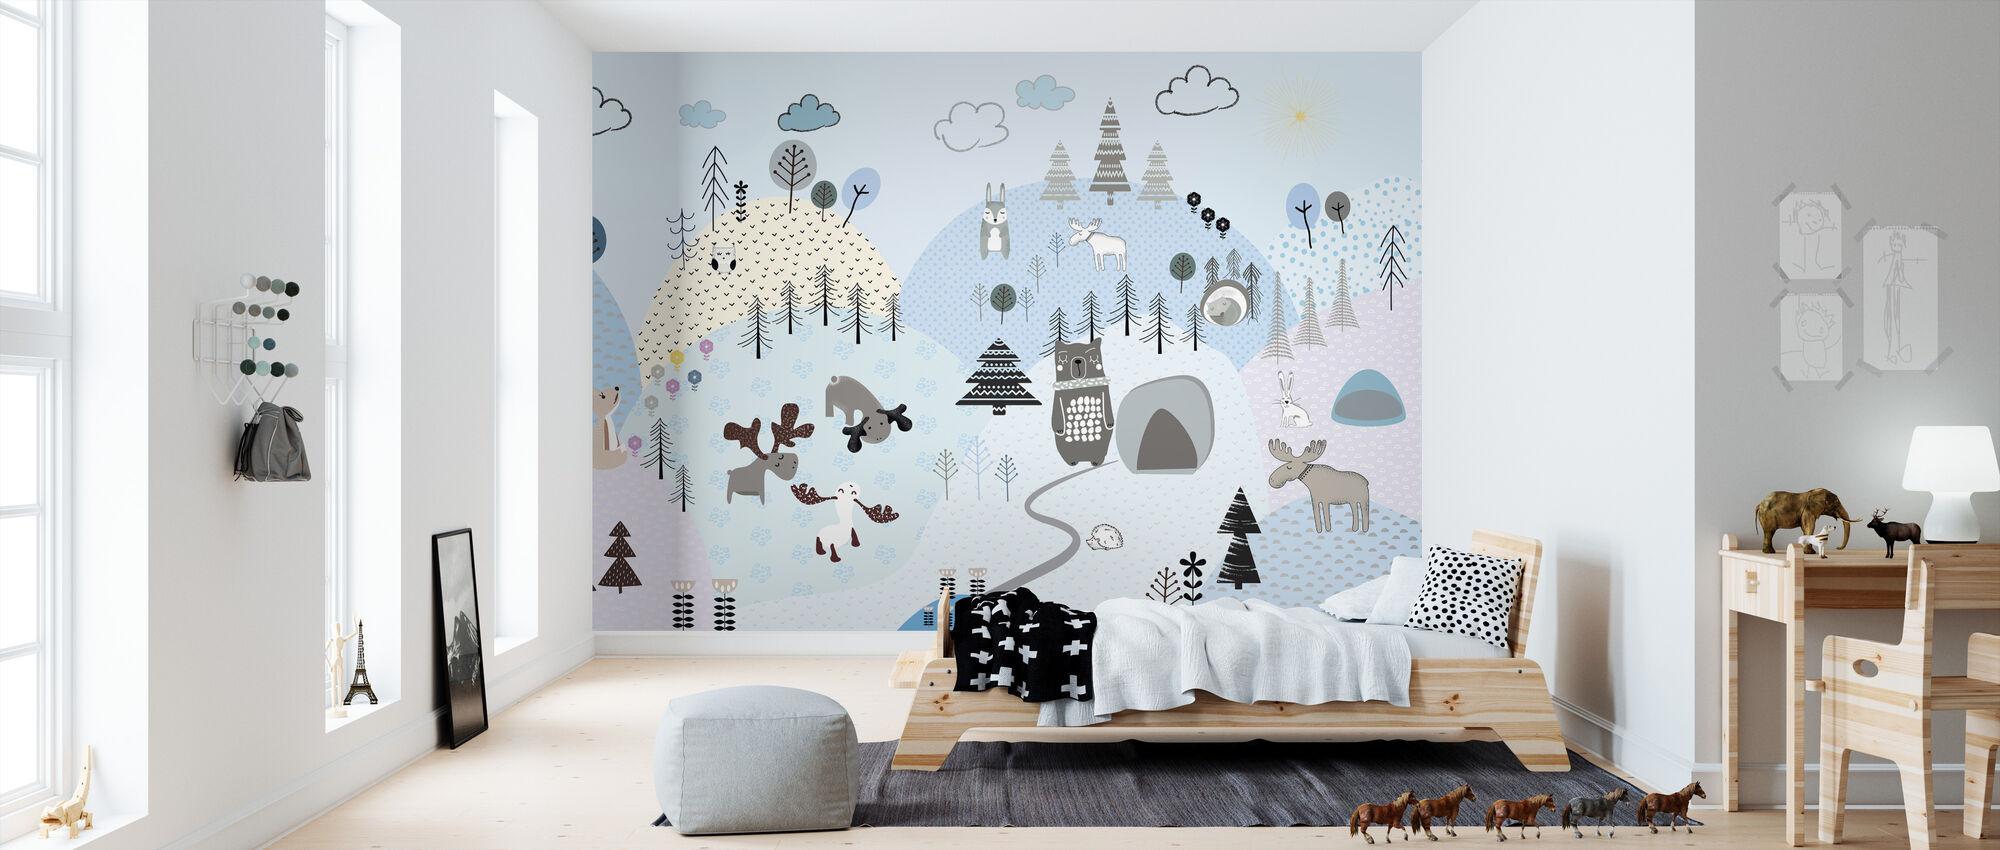 Animal Community VII - Wallpaper - Kids Room